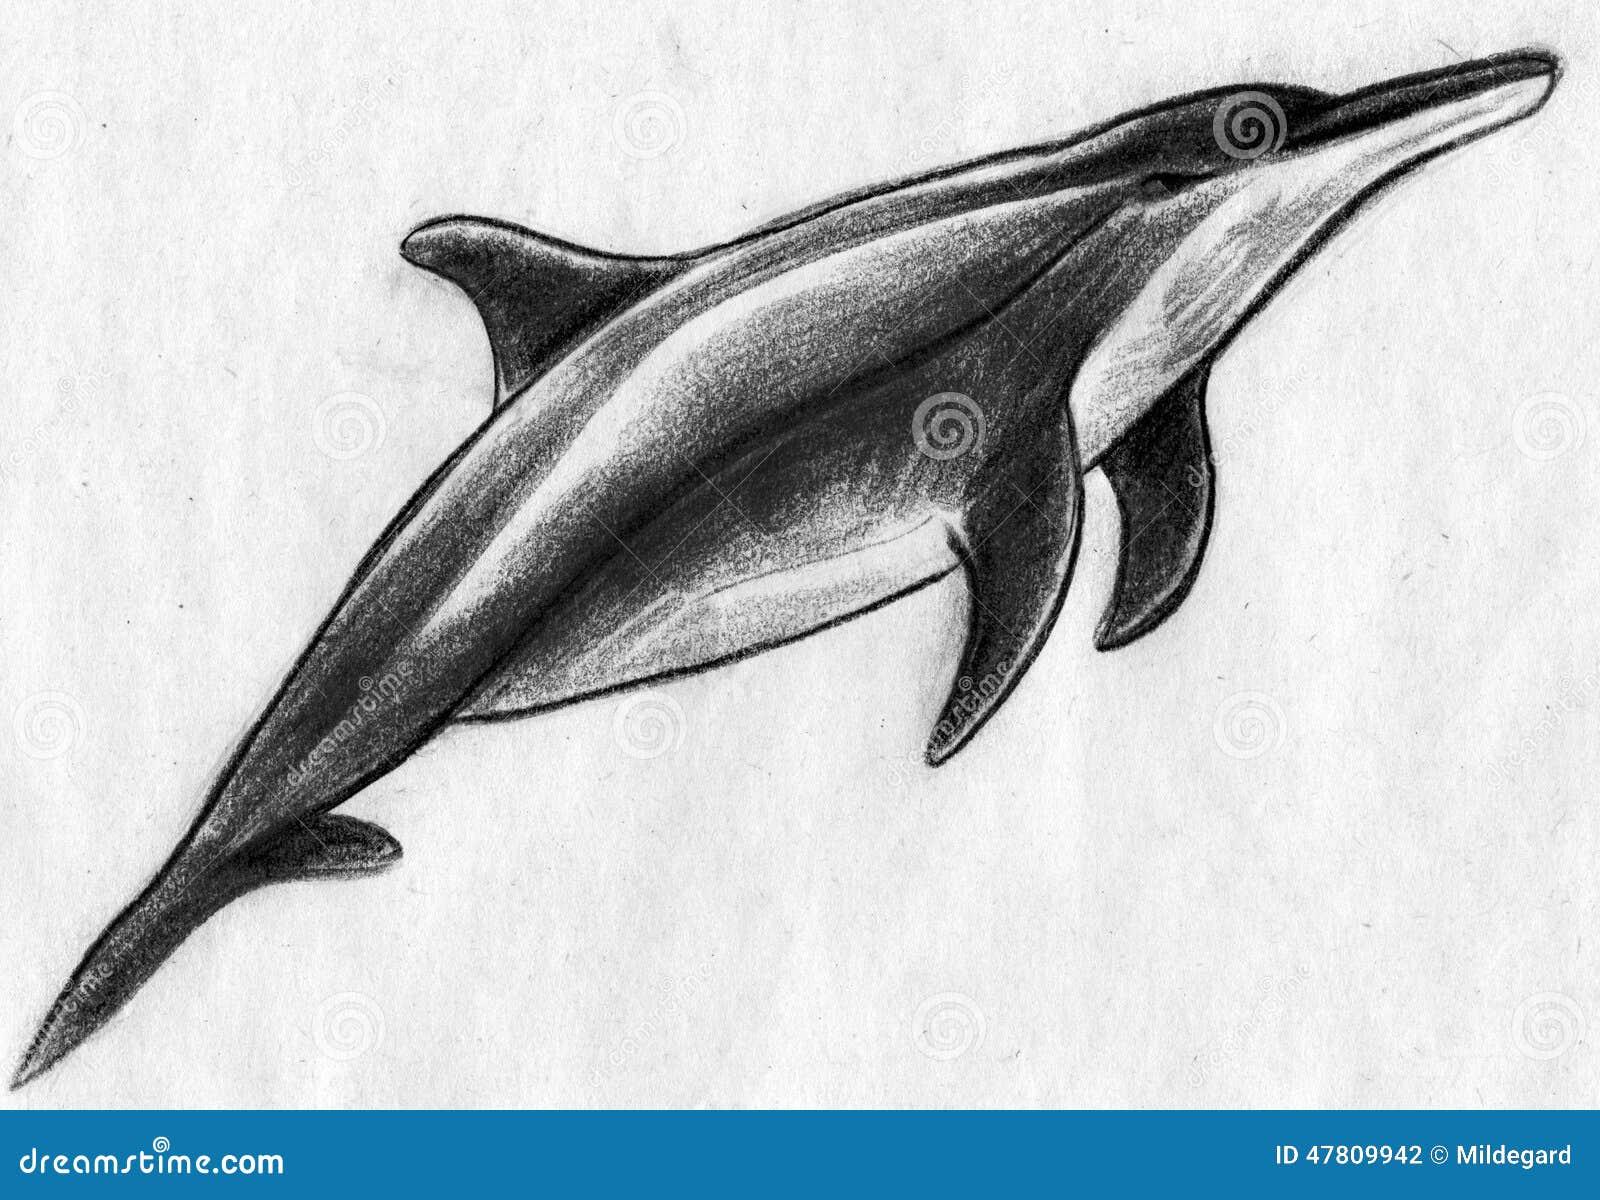 dolphin sketch stock illustration illustration of doplhins 47809942